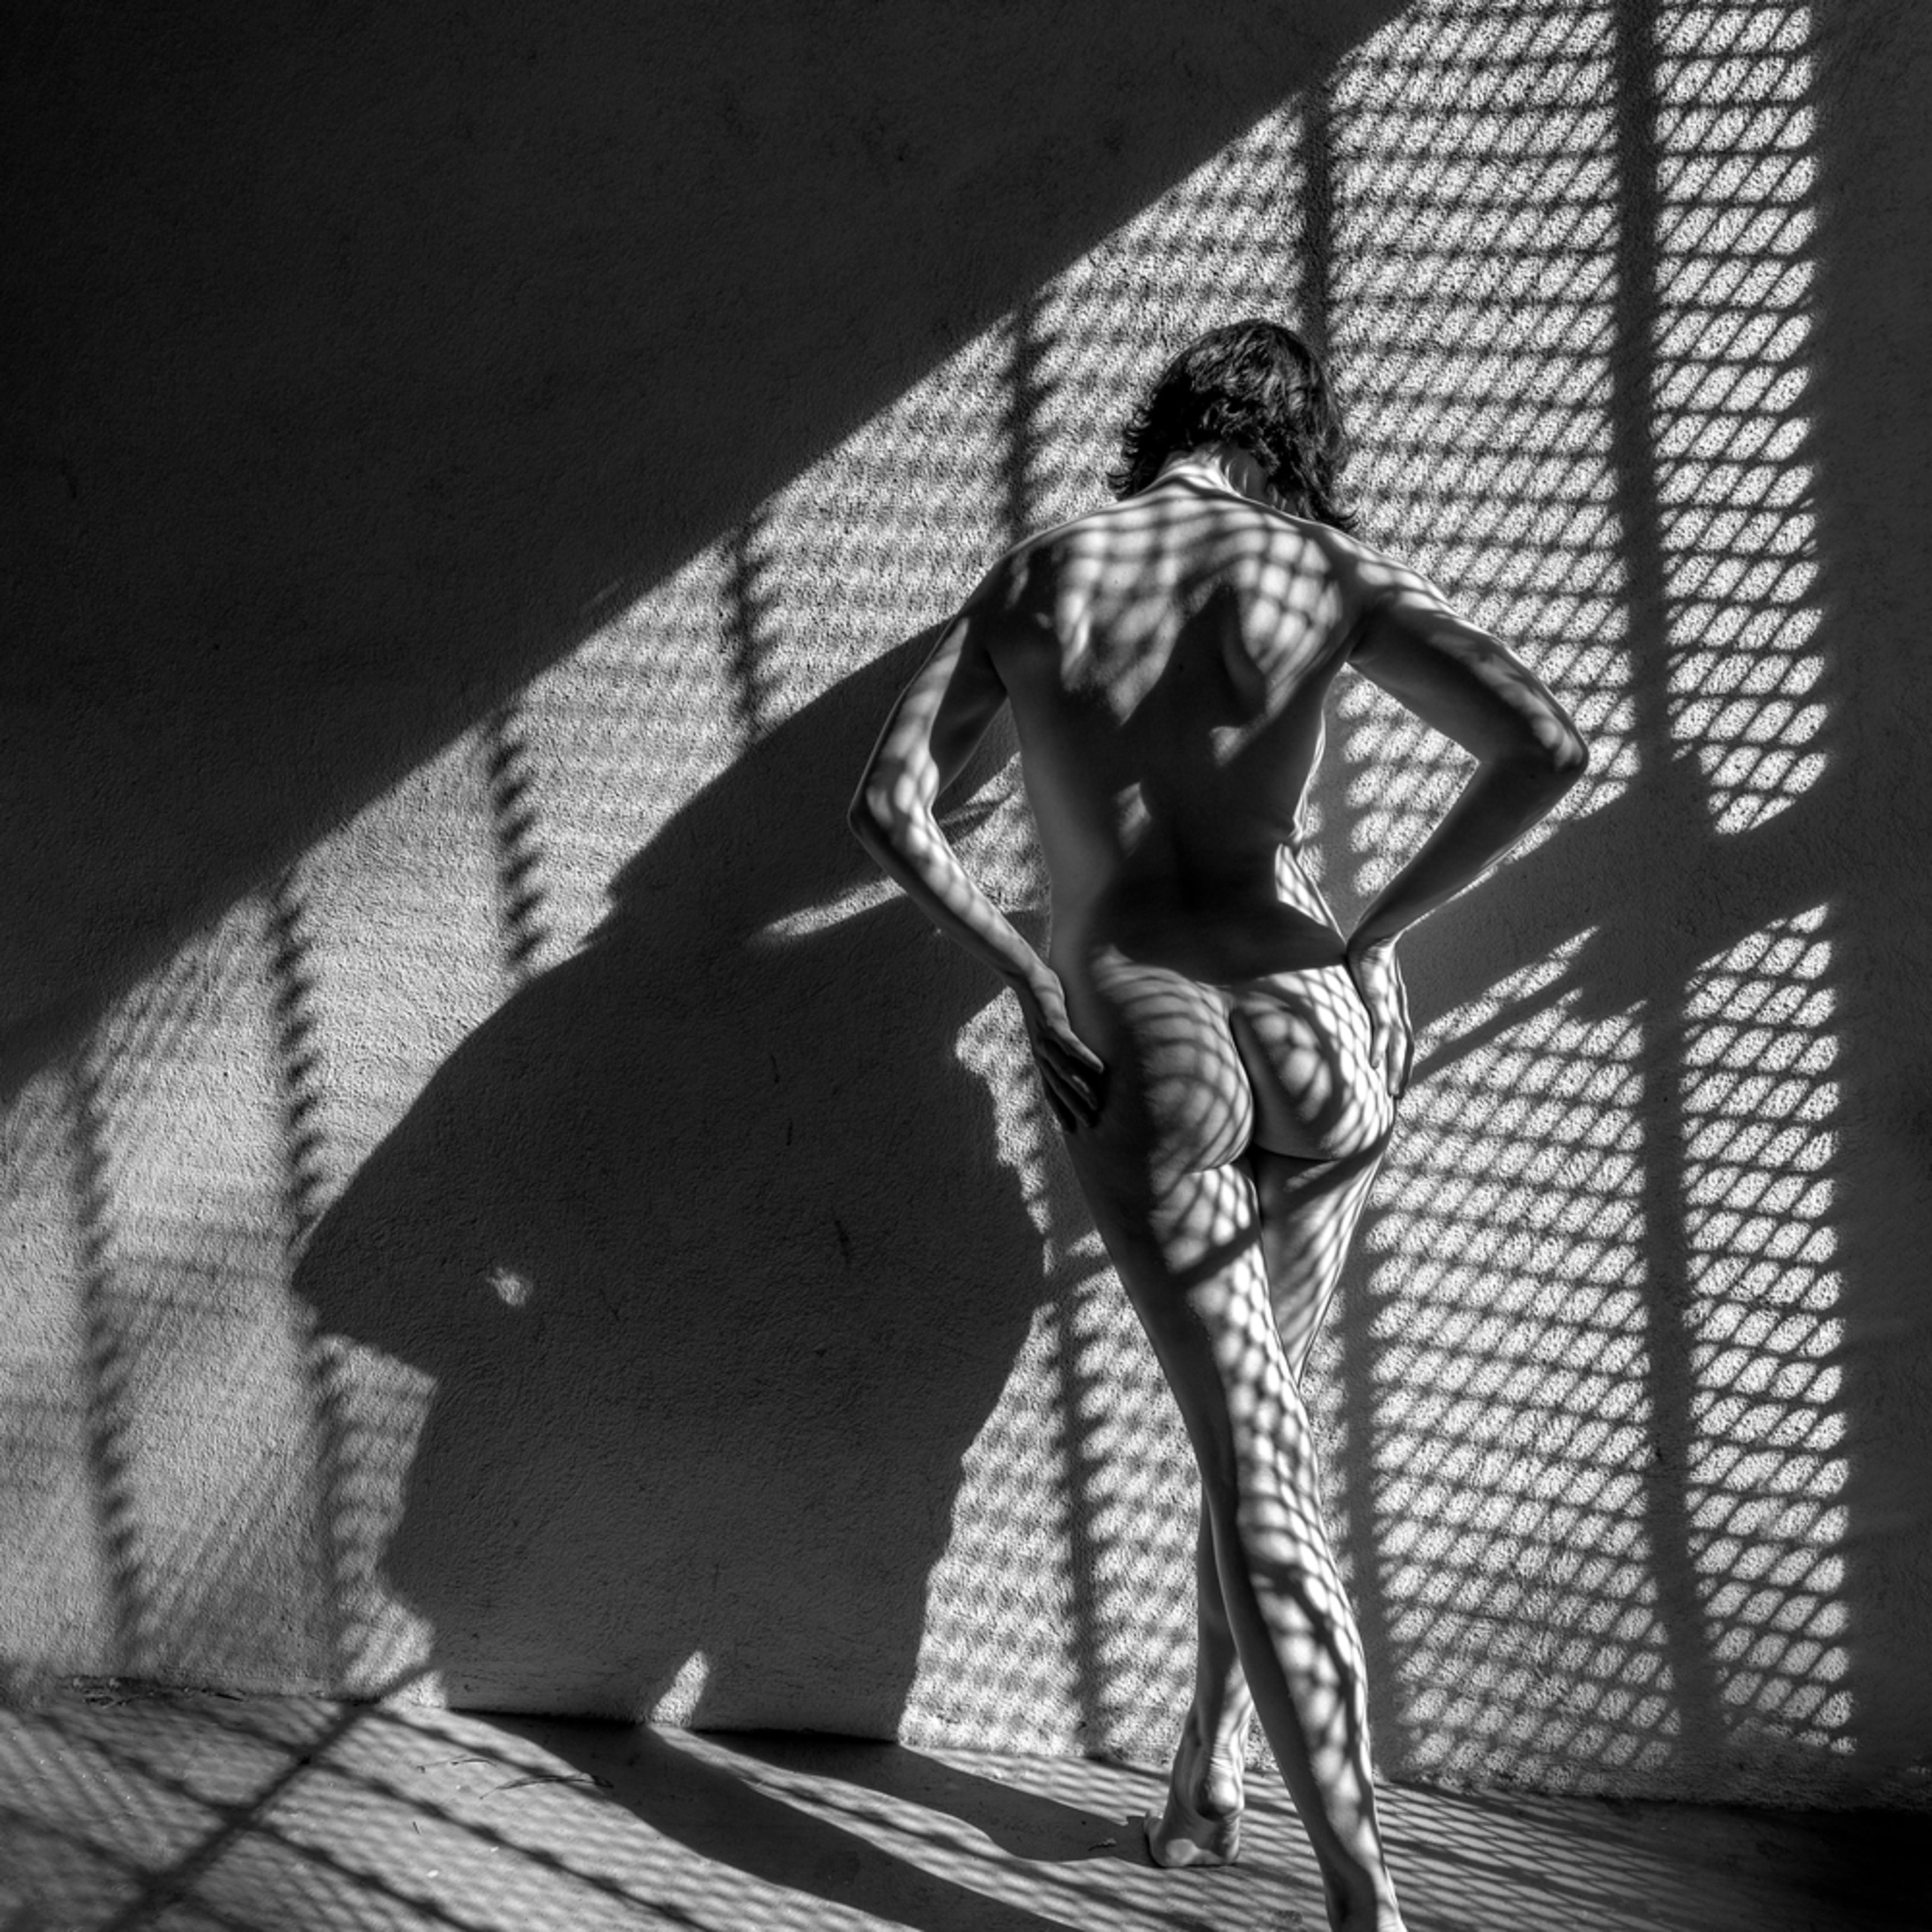 Olive nude shadows 1 juttmq